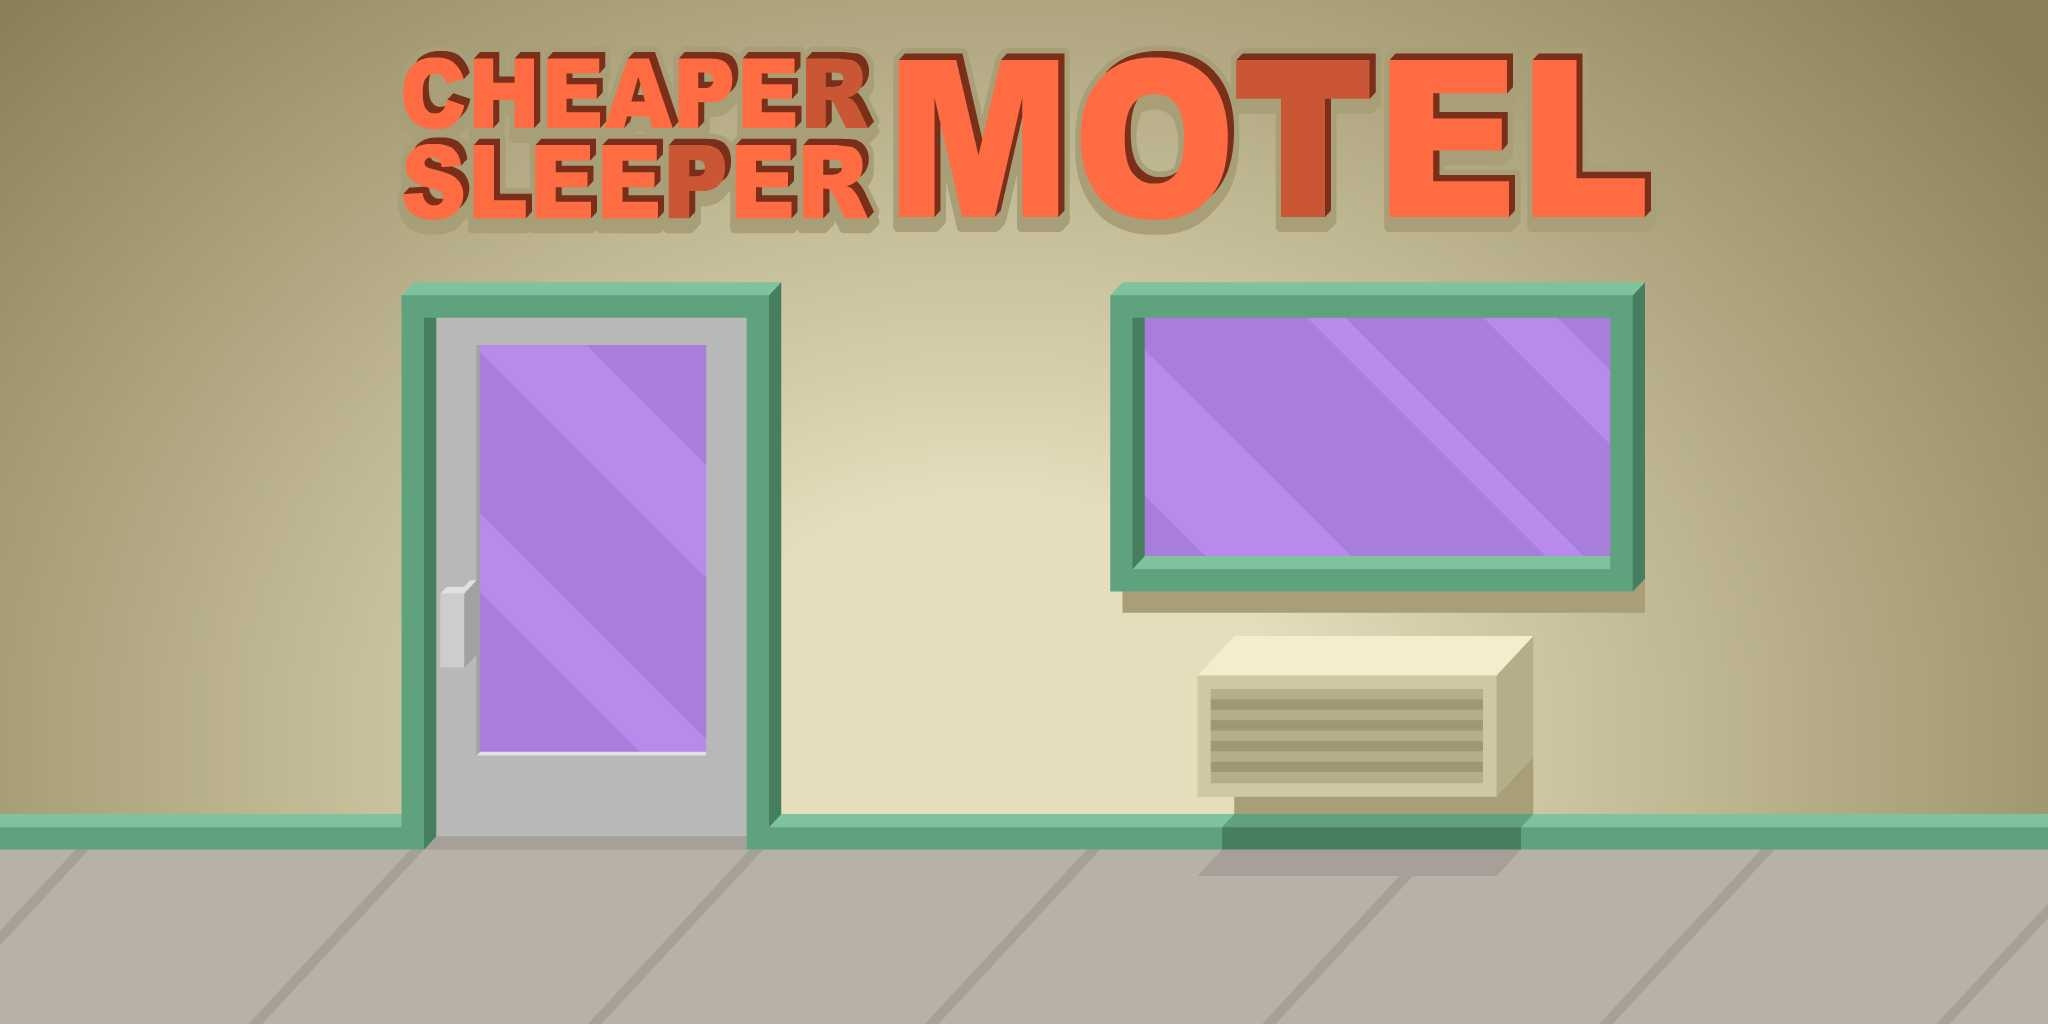 Cheaper Sleeper Motel